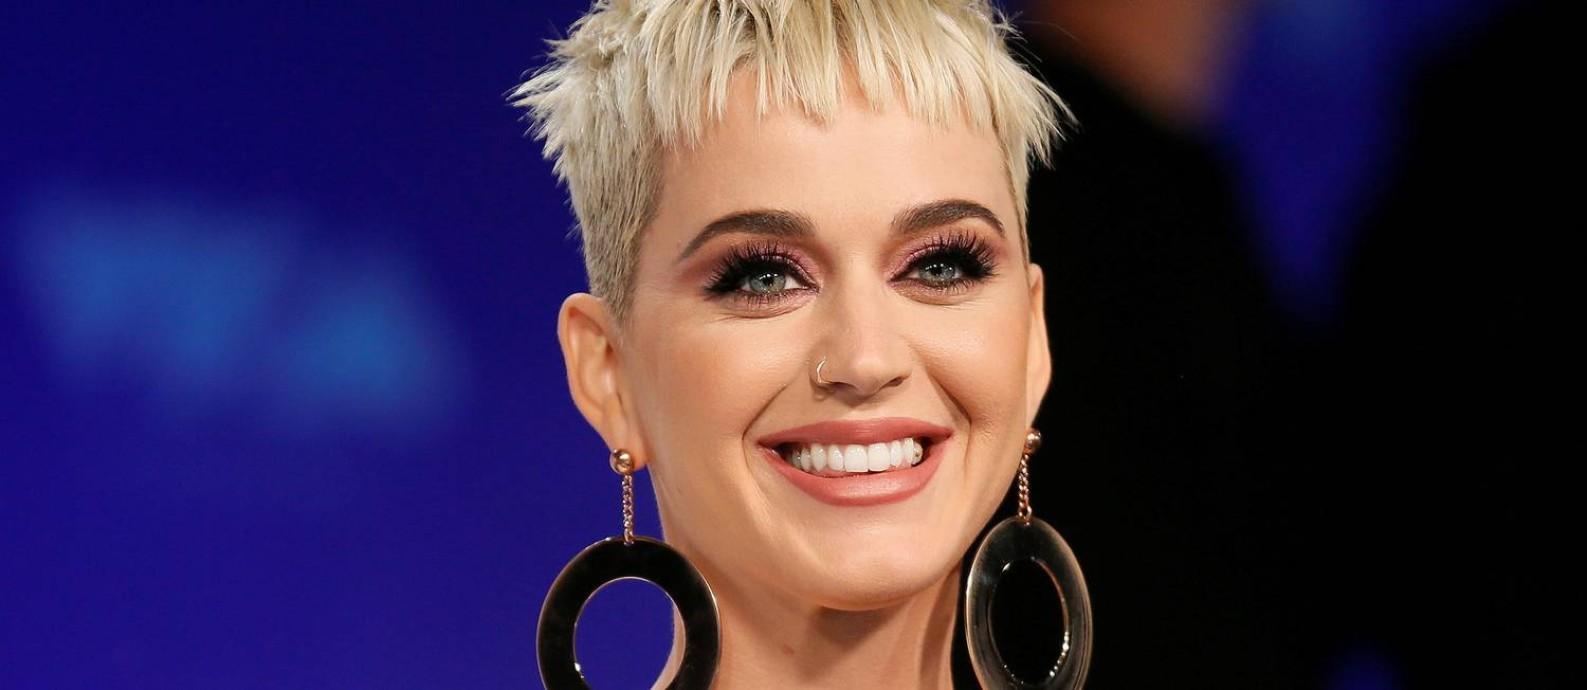 A cantora Katy Perry Foto: Danny Moloshok / Reuters